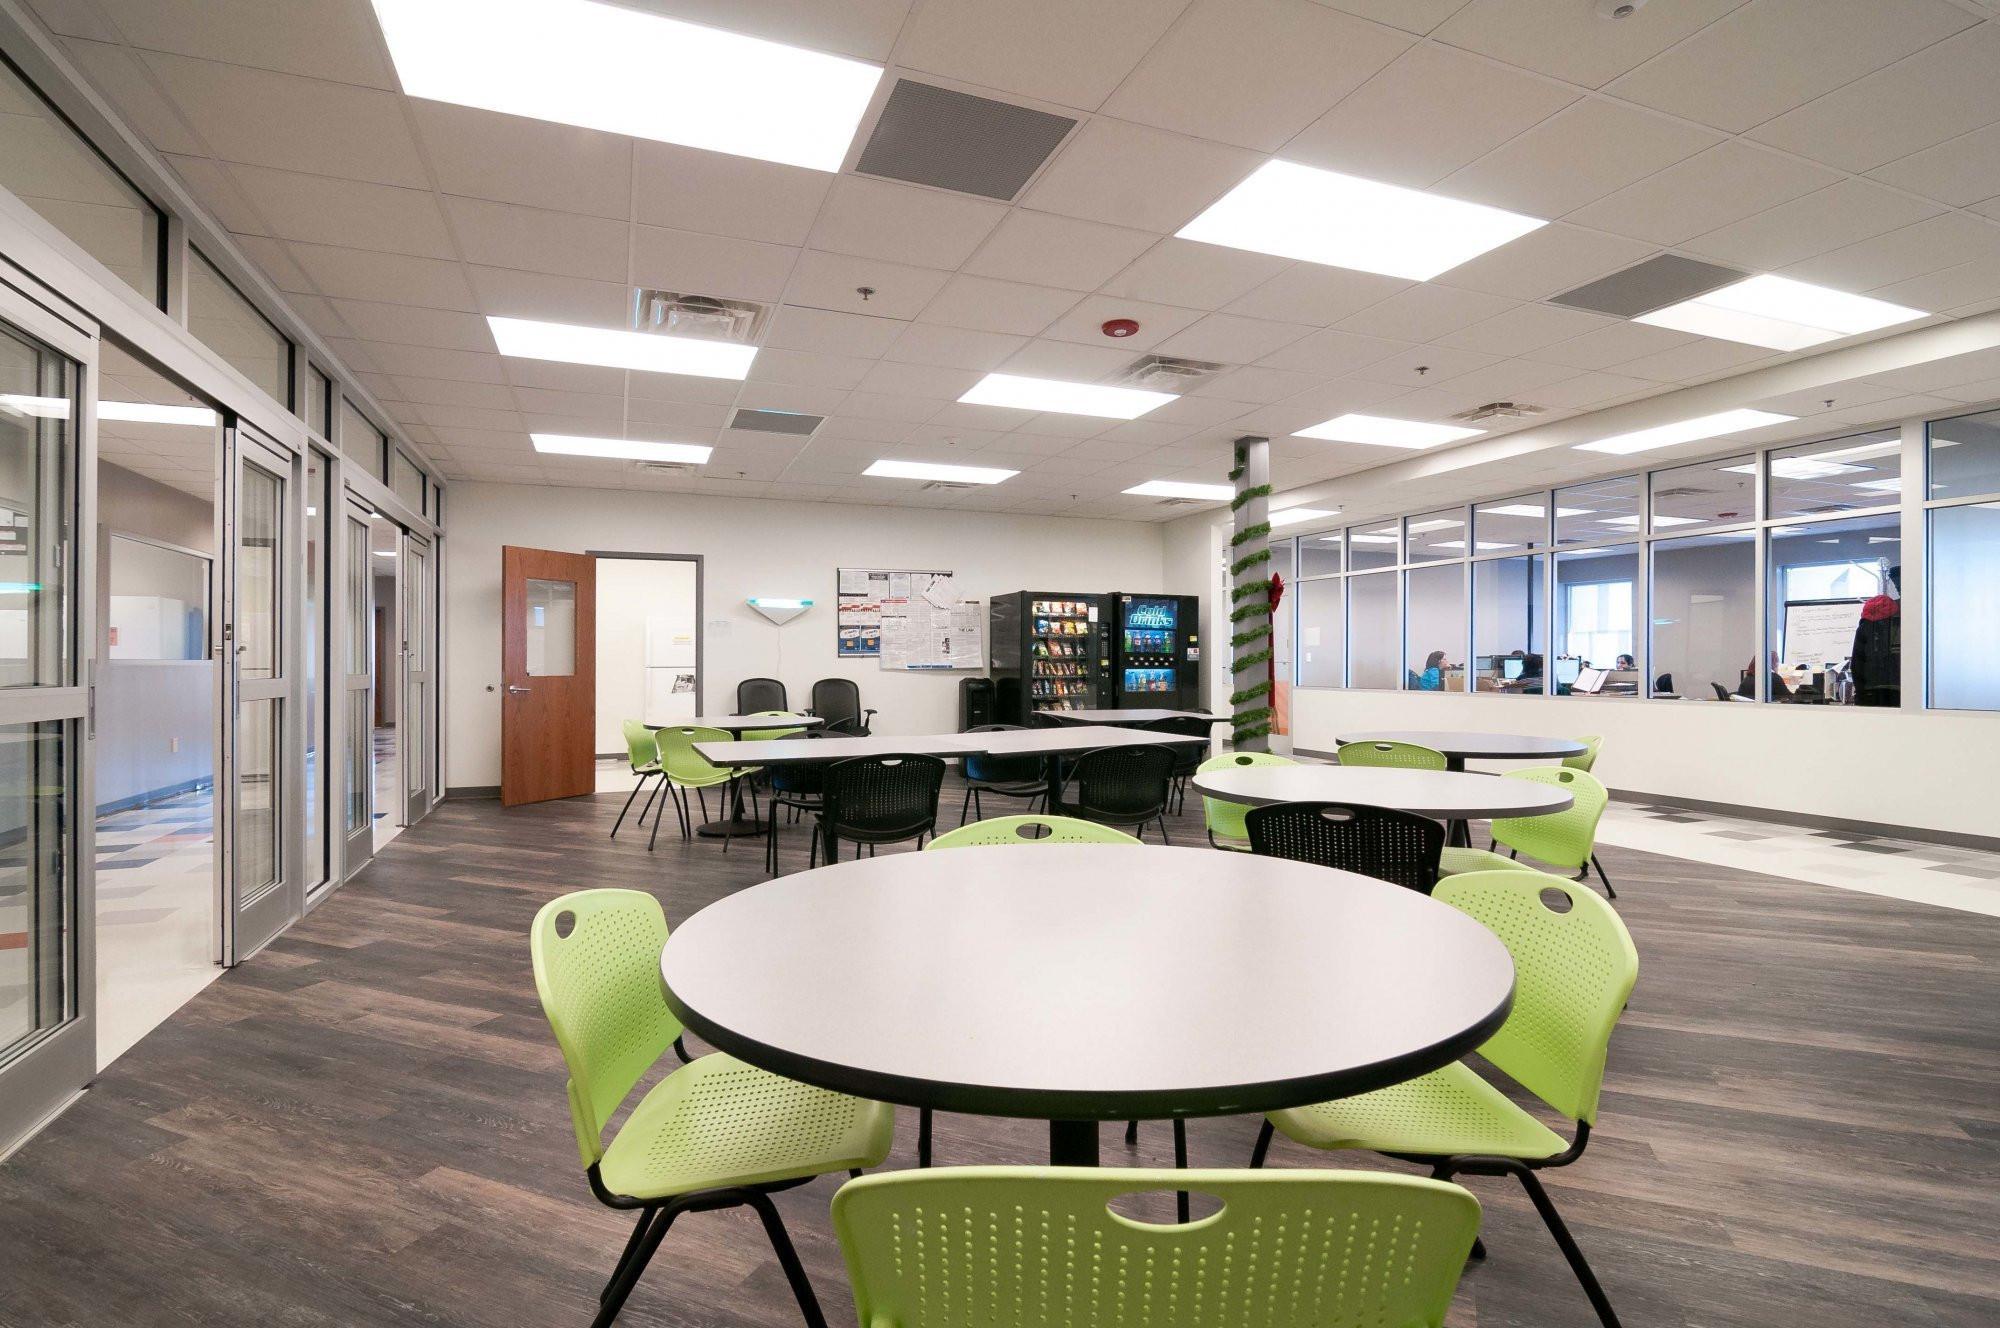 eurofins-office-laboratory-facility-lounge-area